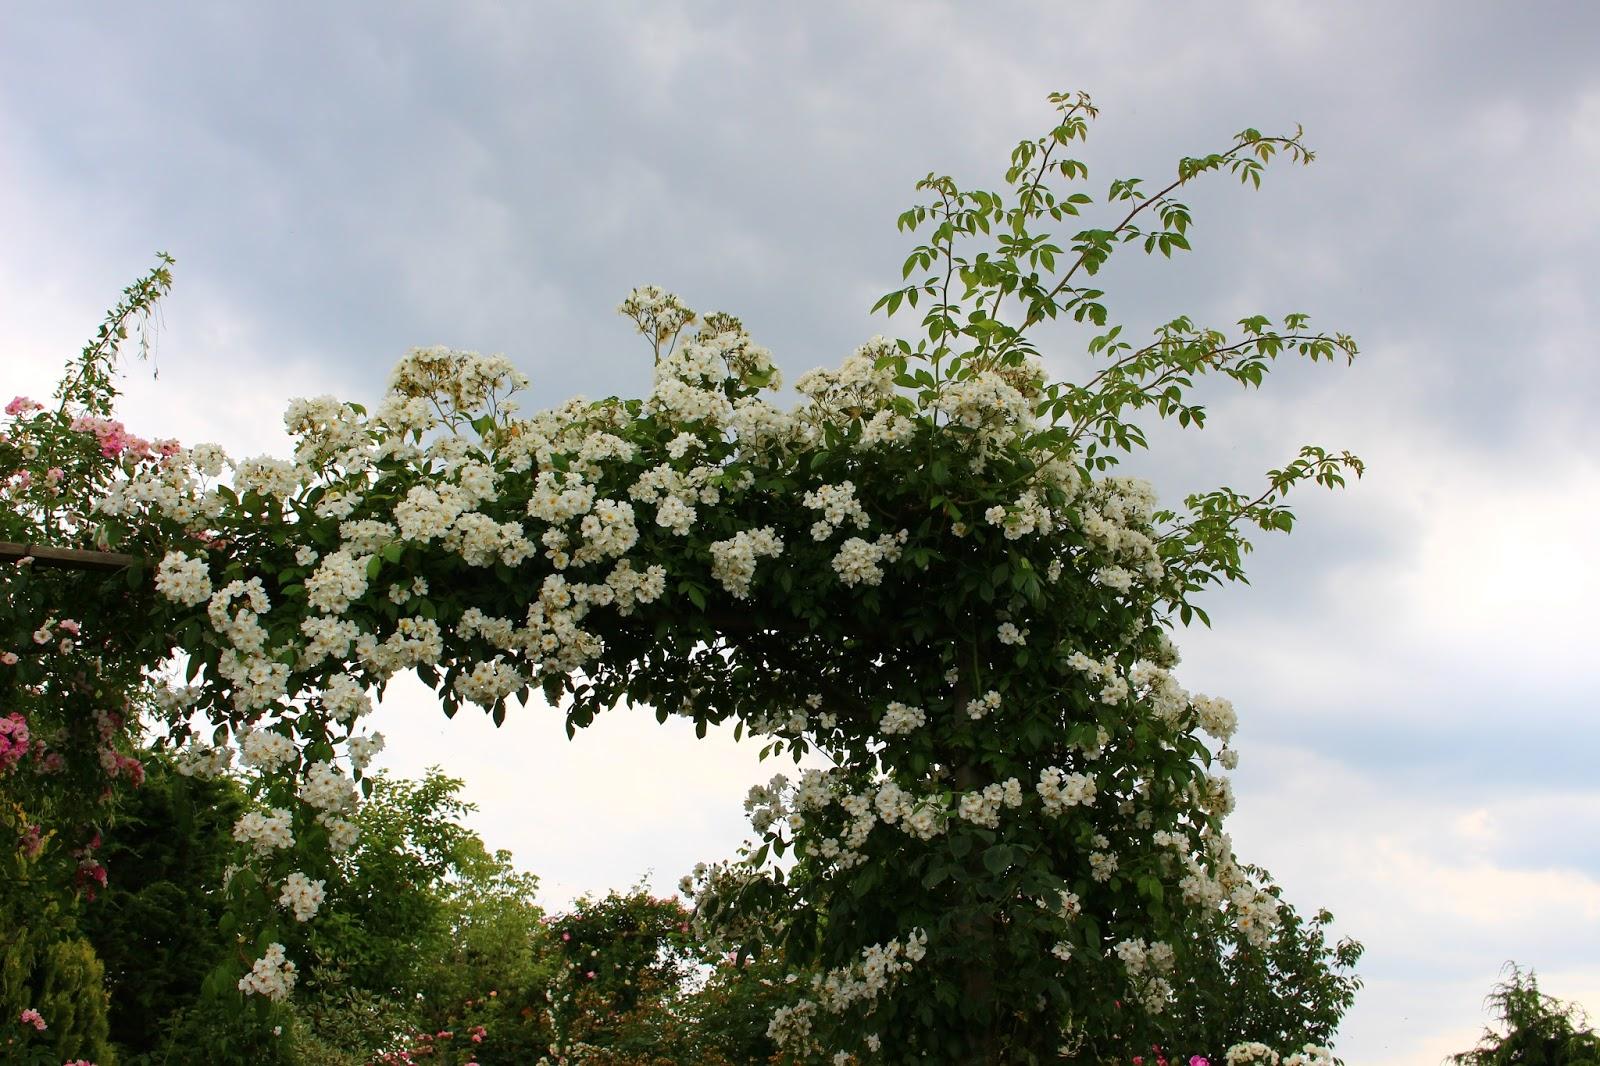 Roses du jardin ch neland taille des rosiers lianes - Taille rosier liane ...